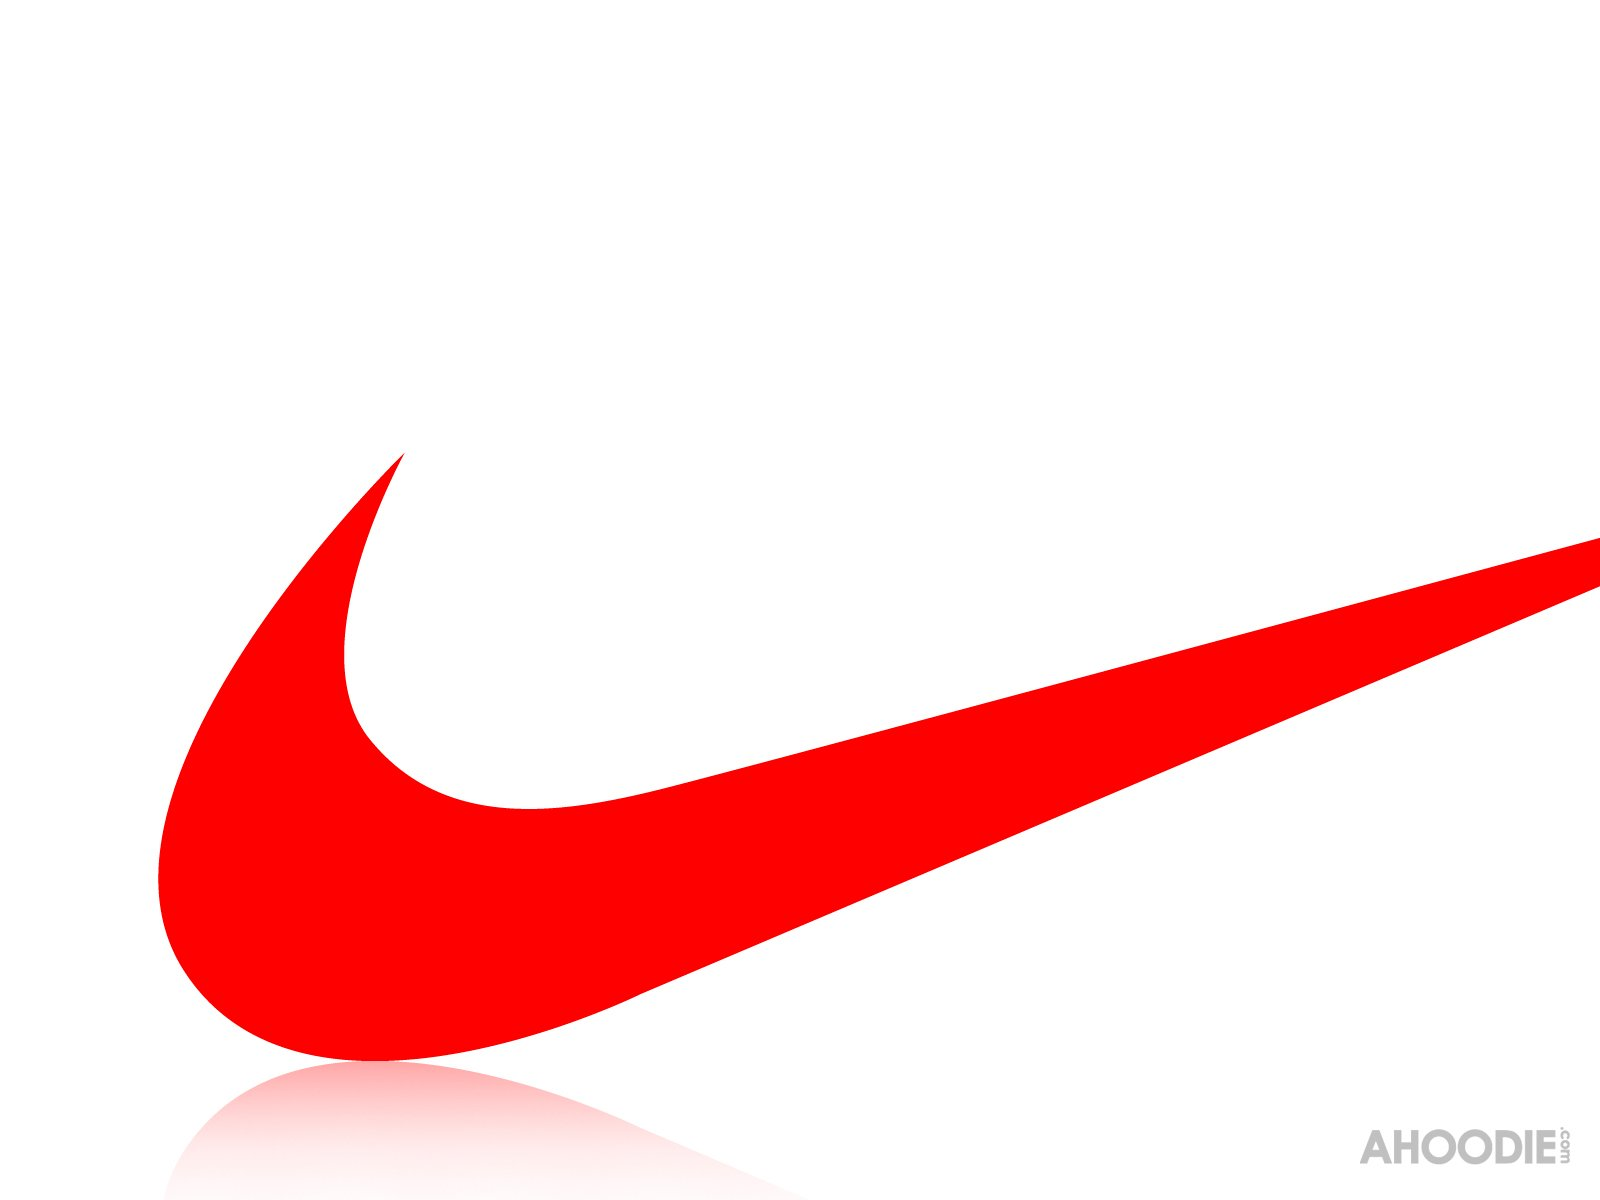 Nike just do it logo iphone wallpaper download roblox - Red Nike Logo